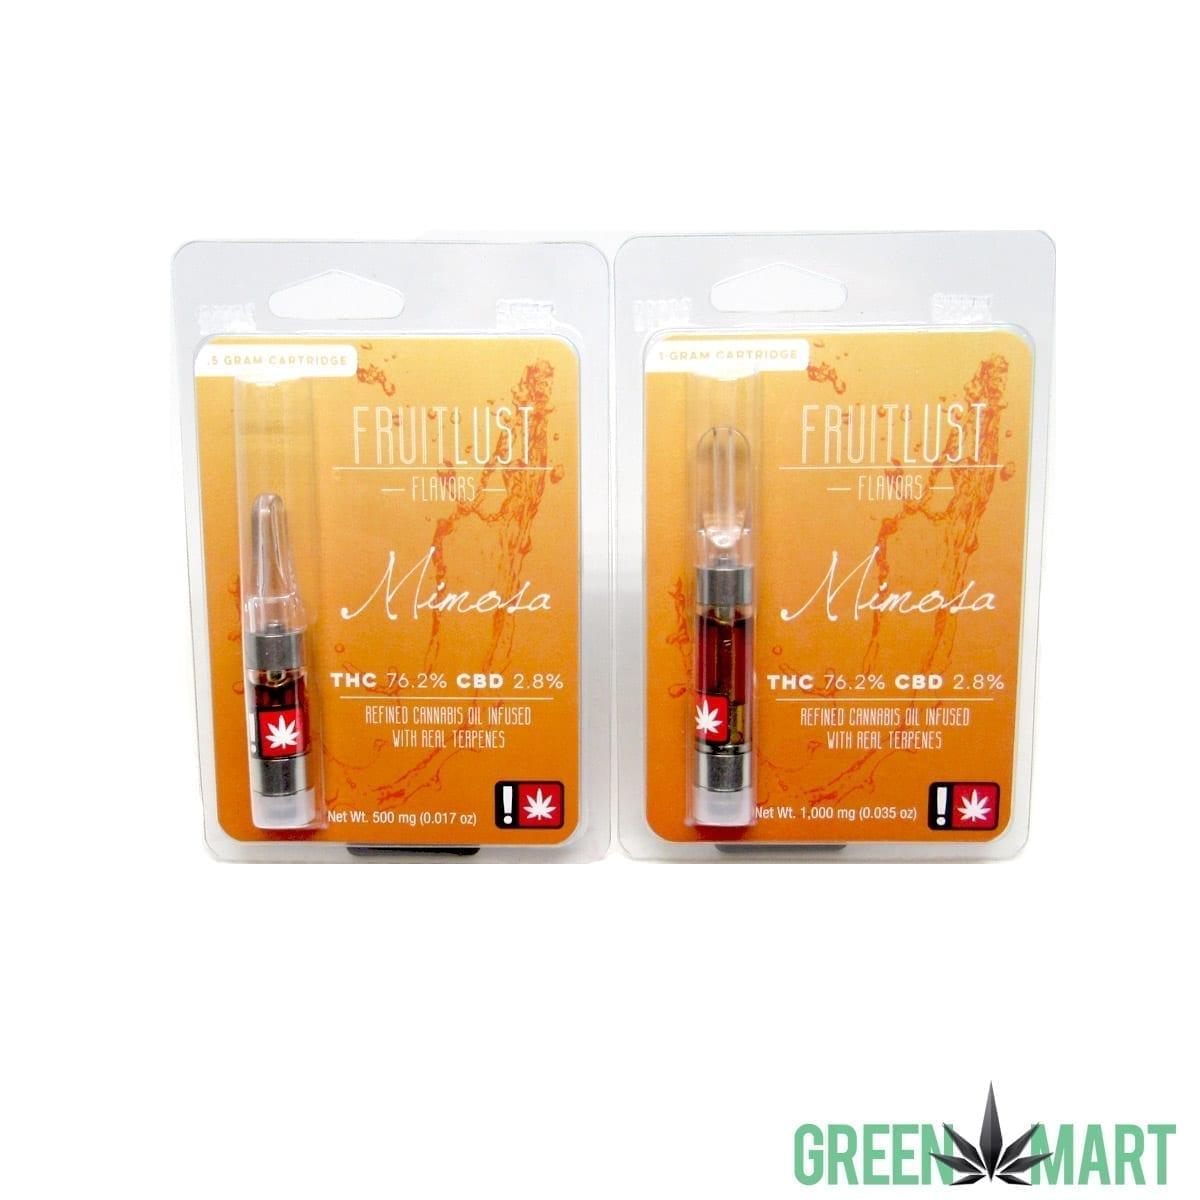 Fruitlust Cartridges - Mimosa